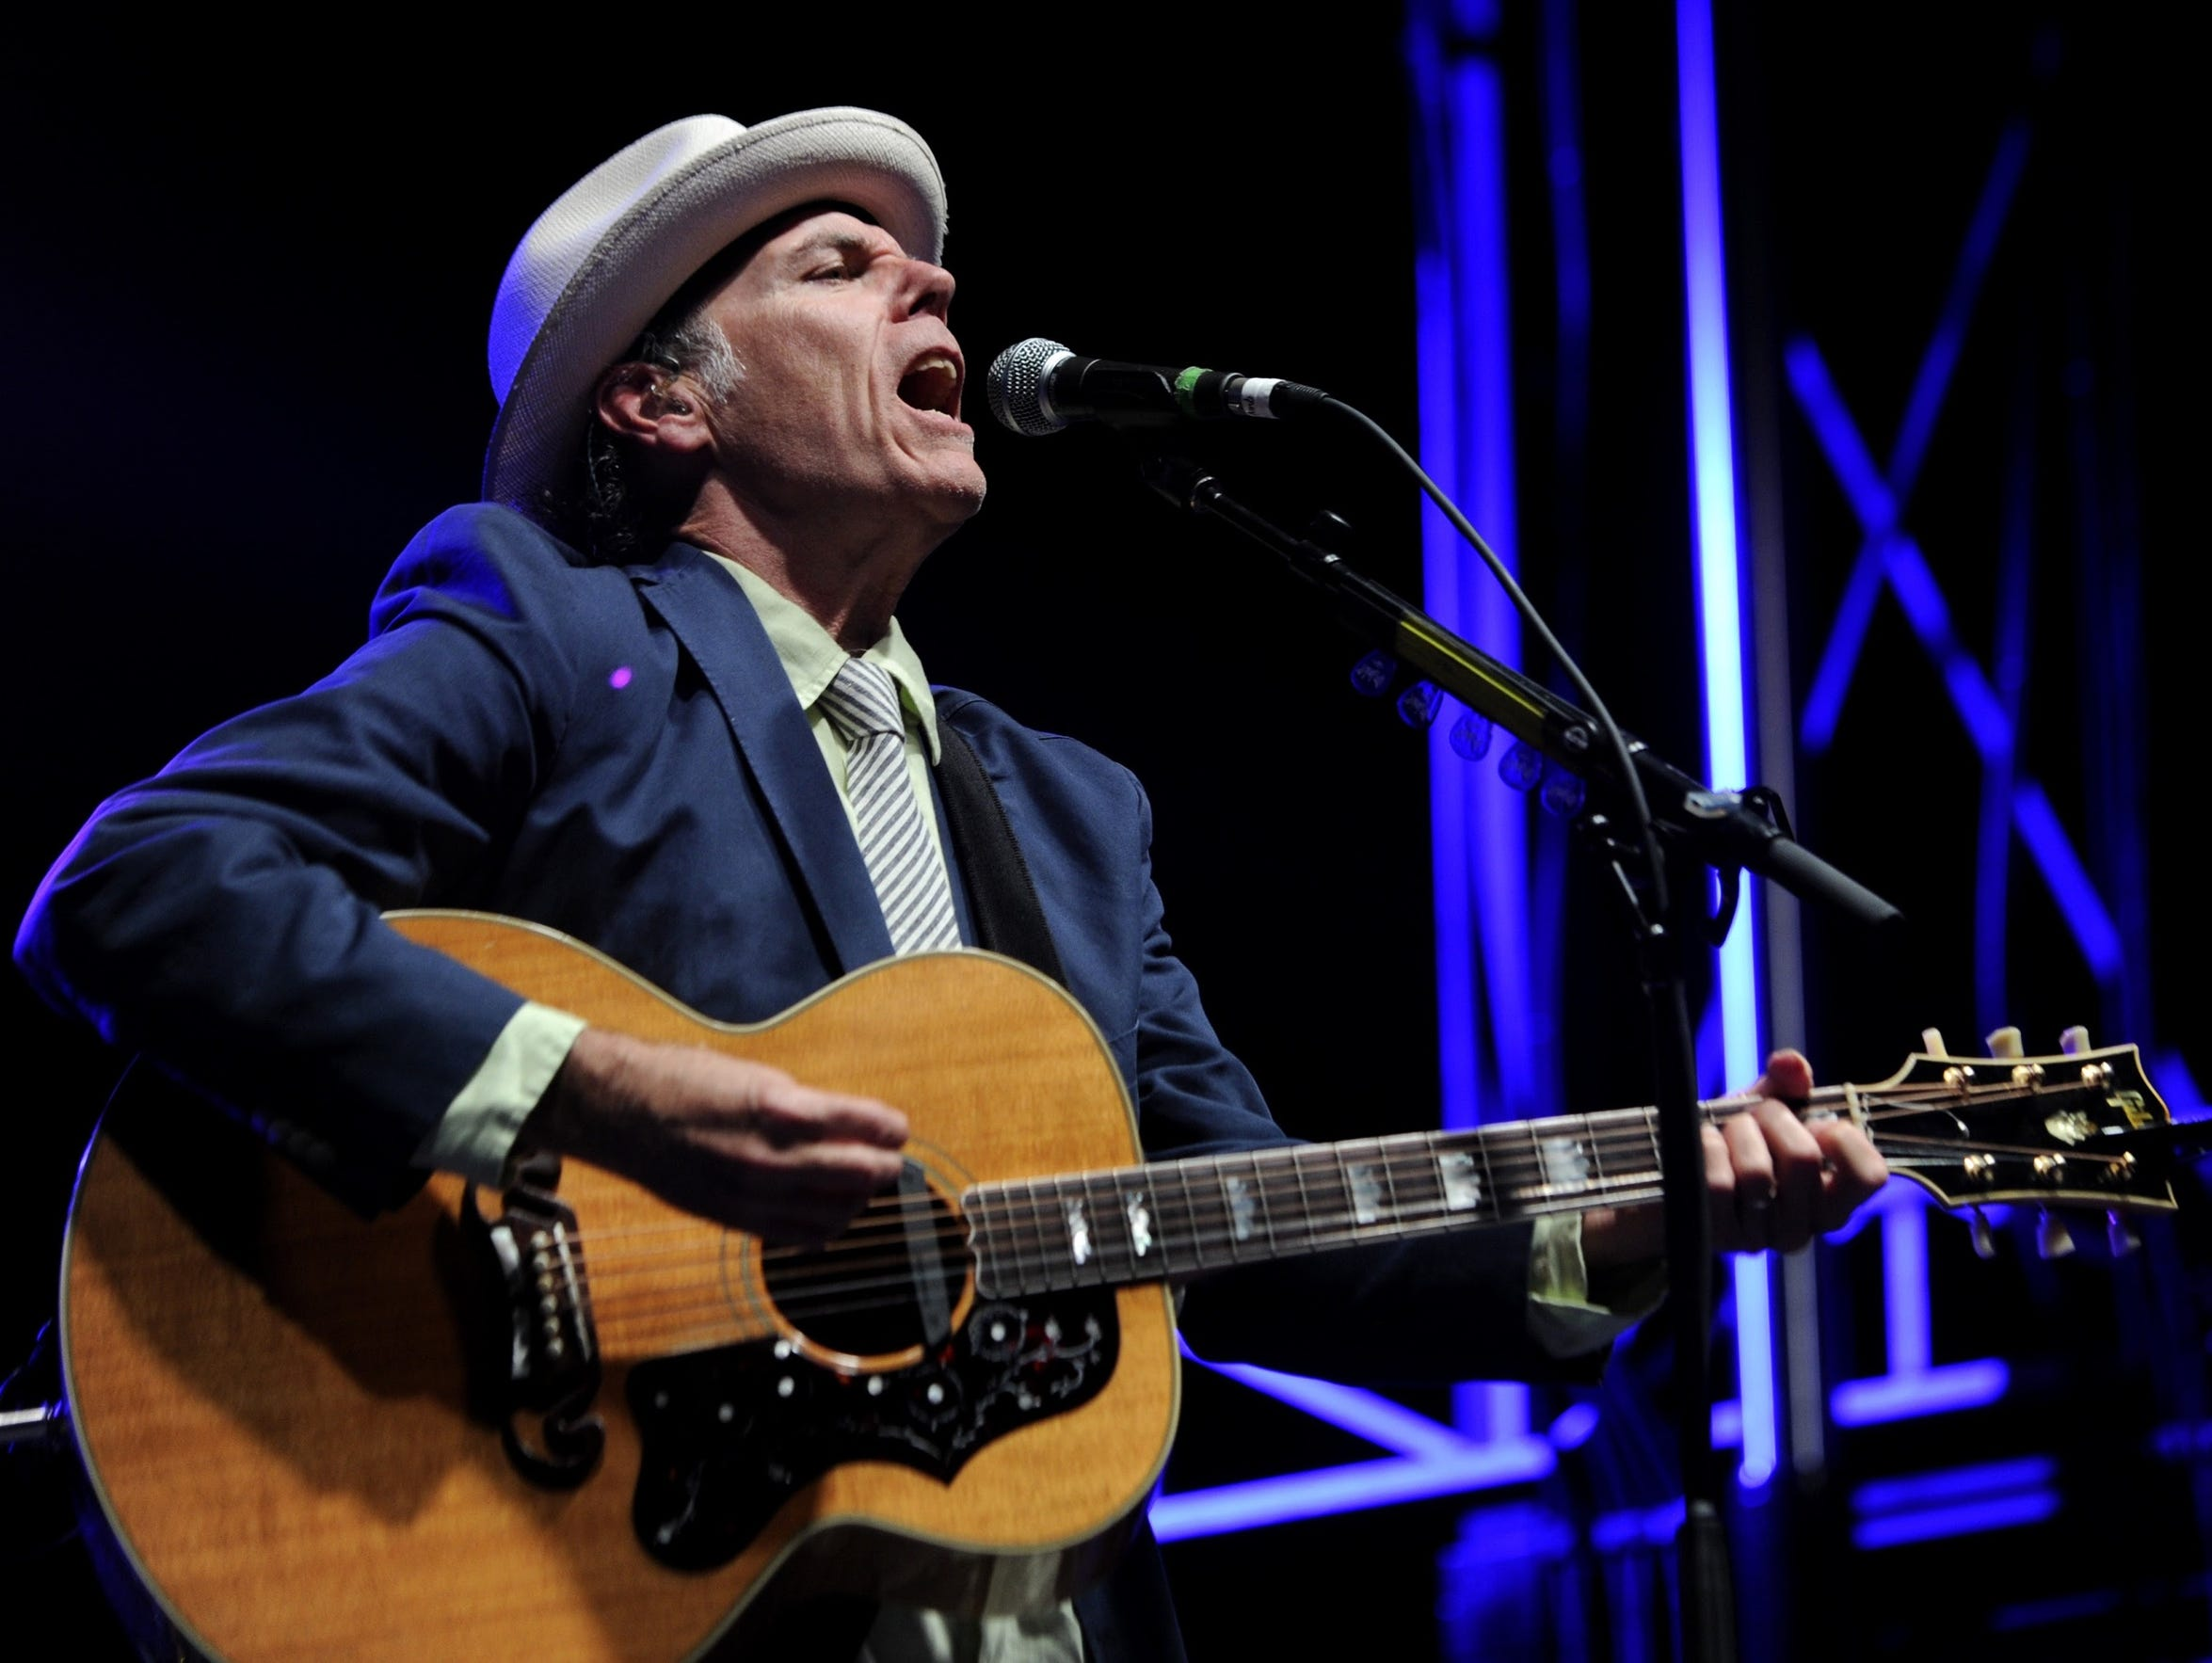 John Hiatt received the Americana Music Association's